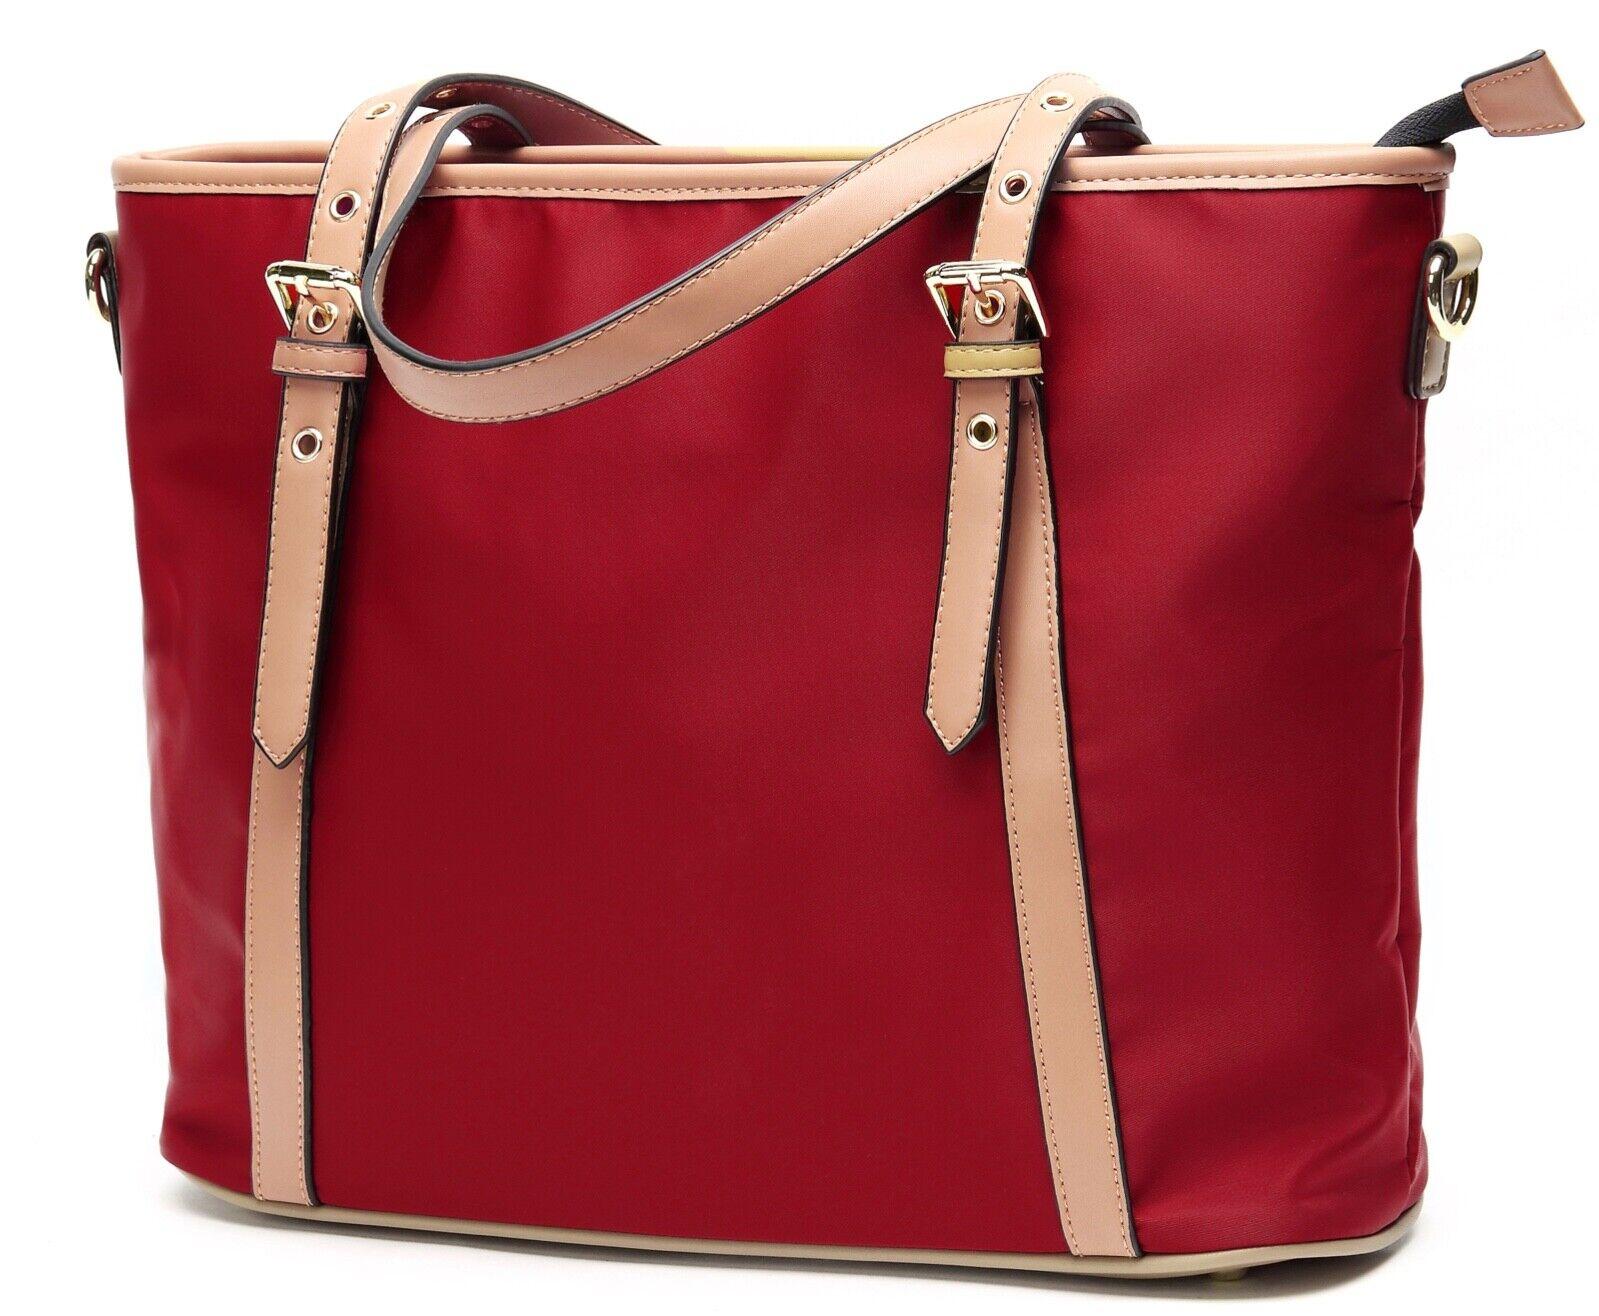 Nylon Handbags Tote Purse for Women Lightweight Water Resist